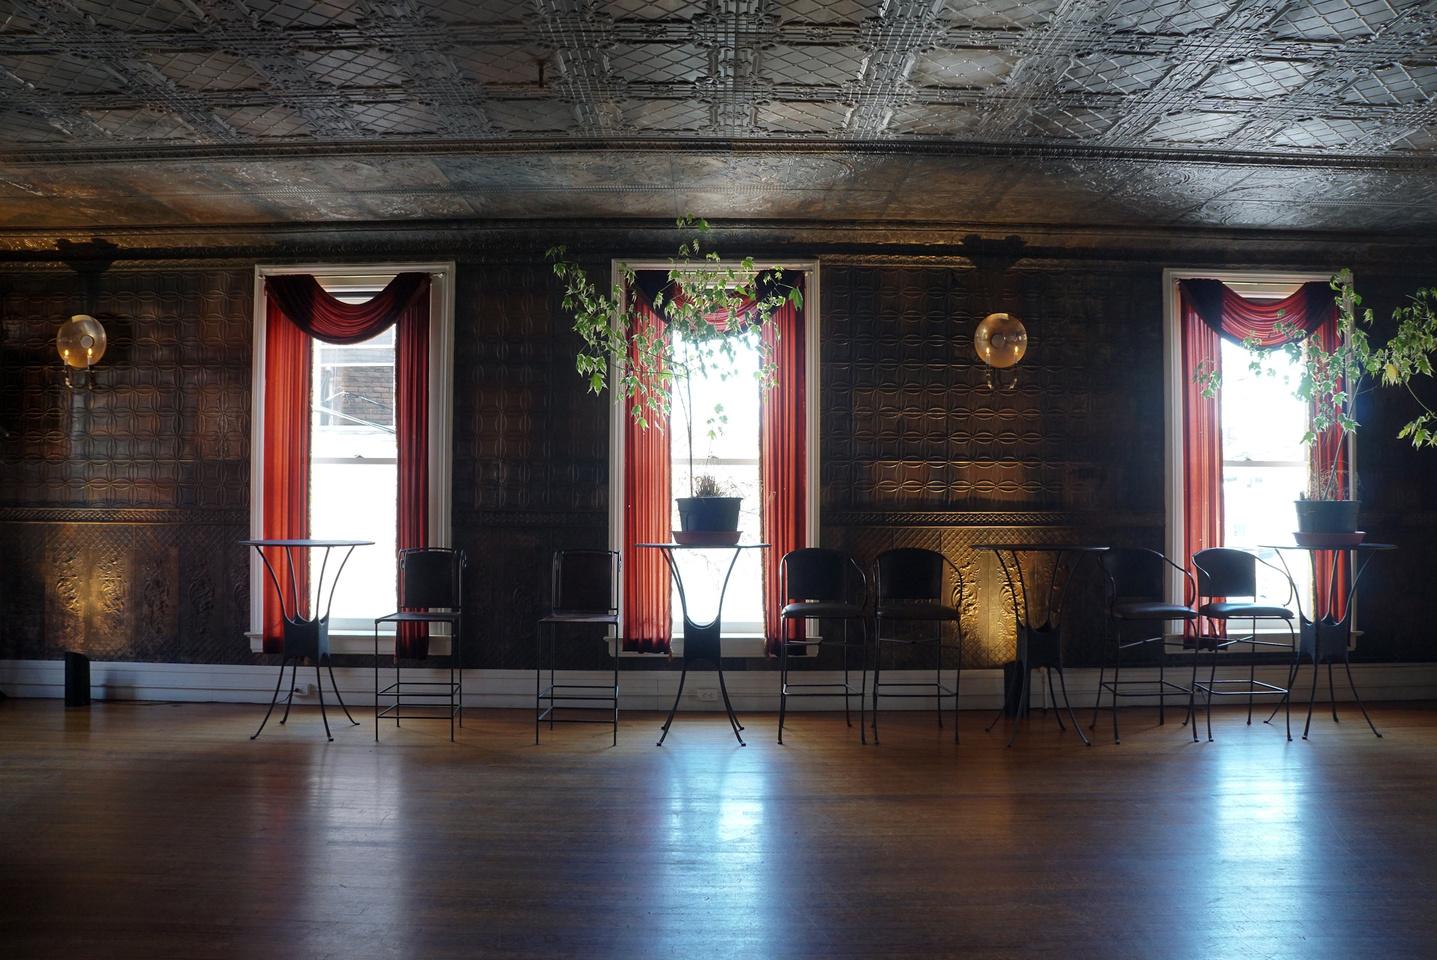 The ballroom still boasts its original tin walls and ceiling.